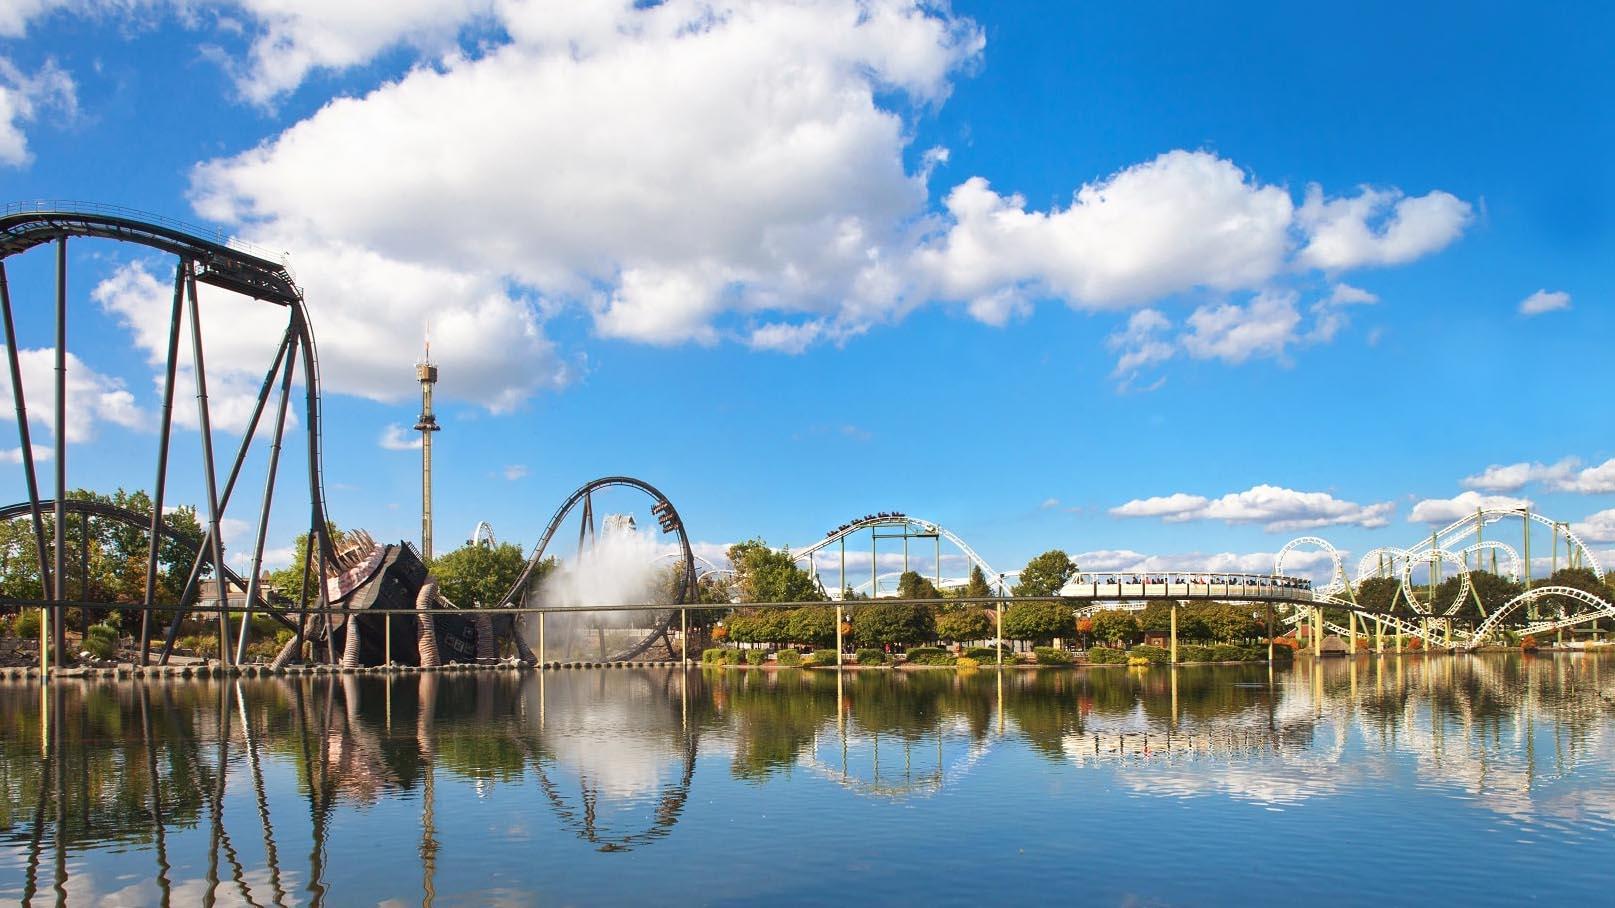 heide-park-resort-seeblick